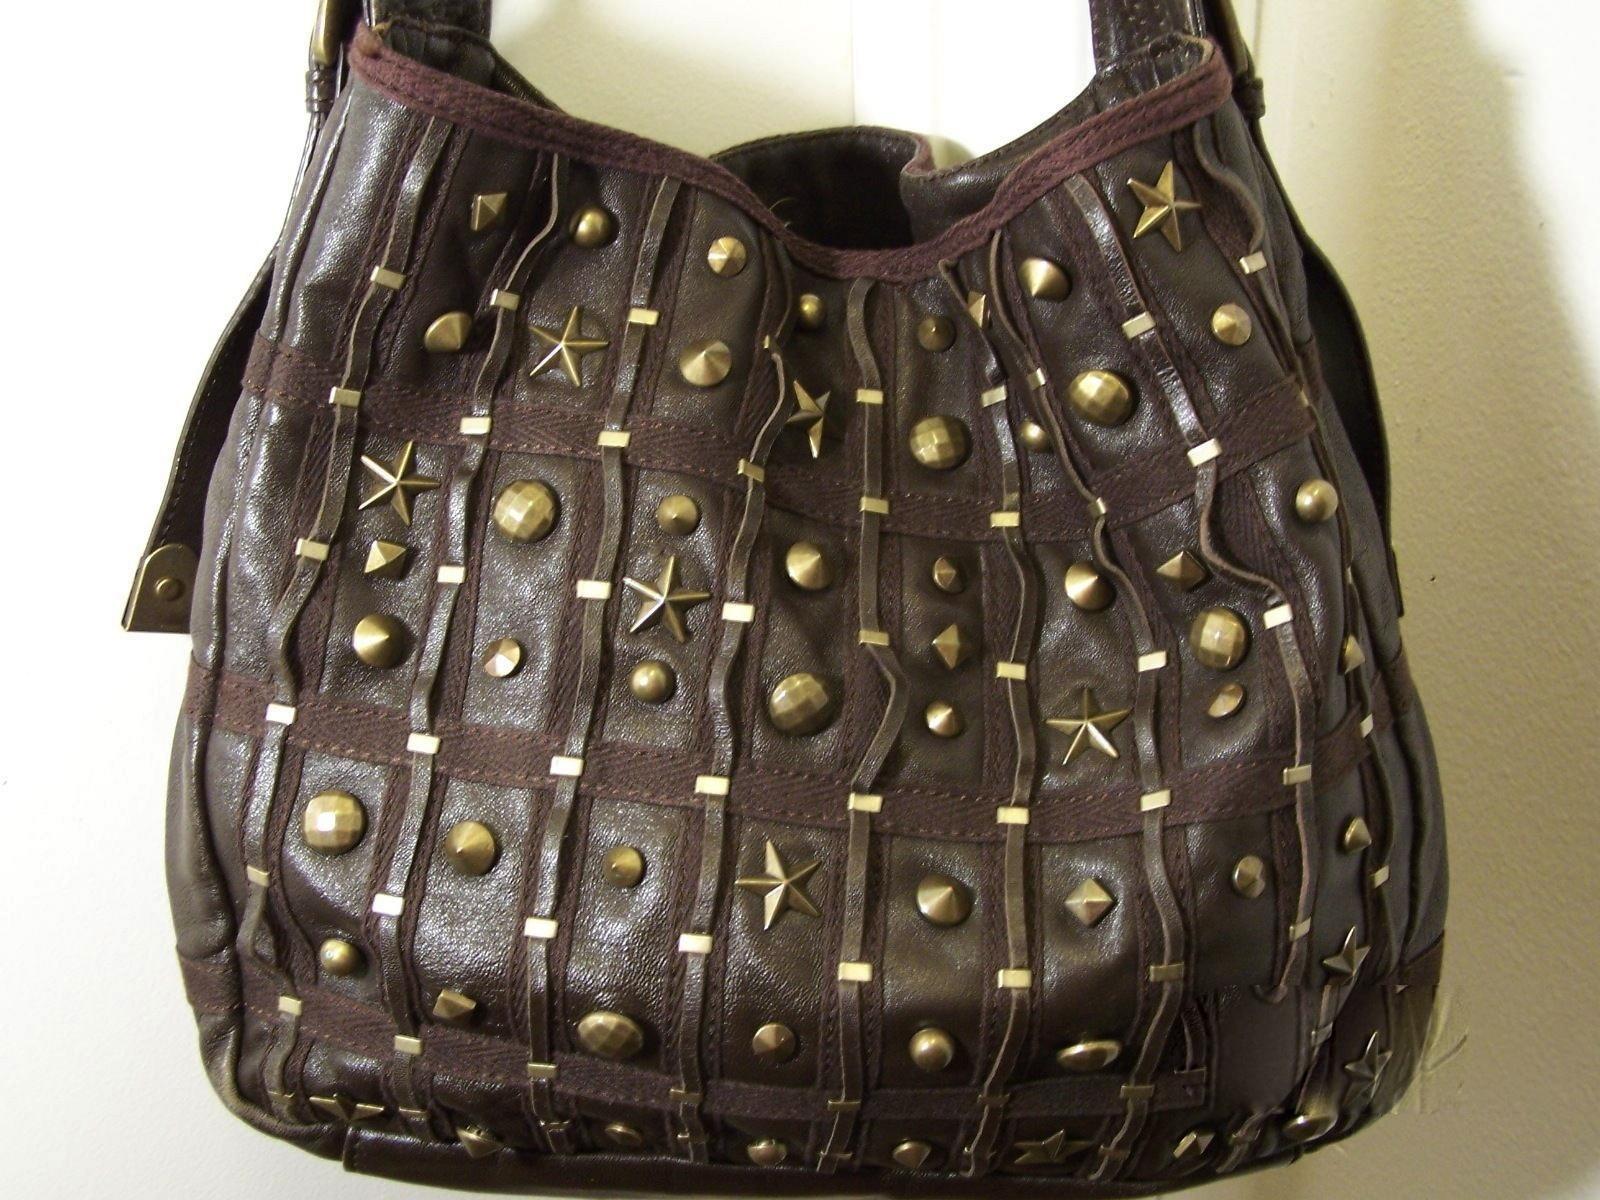 Betsey Johnson Brown Leather Shoulder Bag/Purse w/Bronze Tone Studs Decor